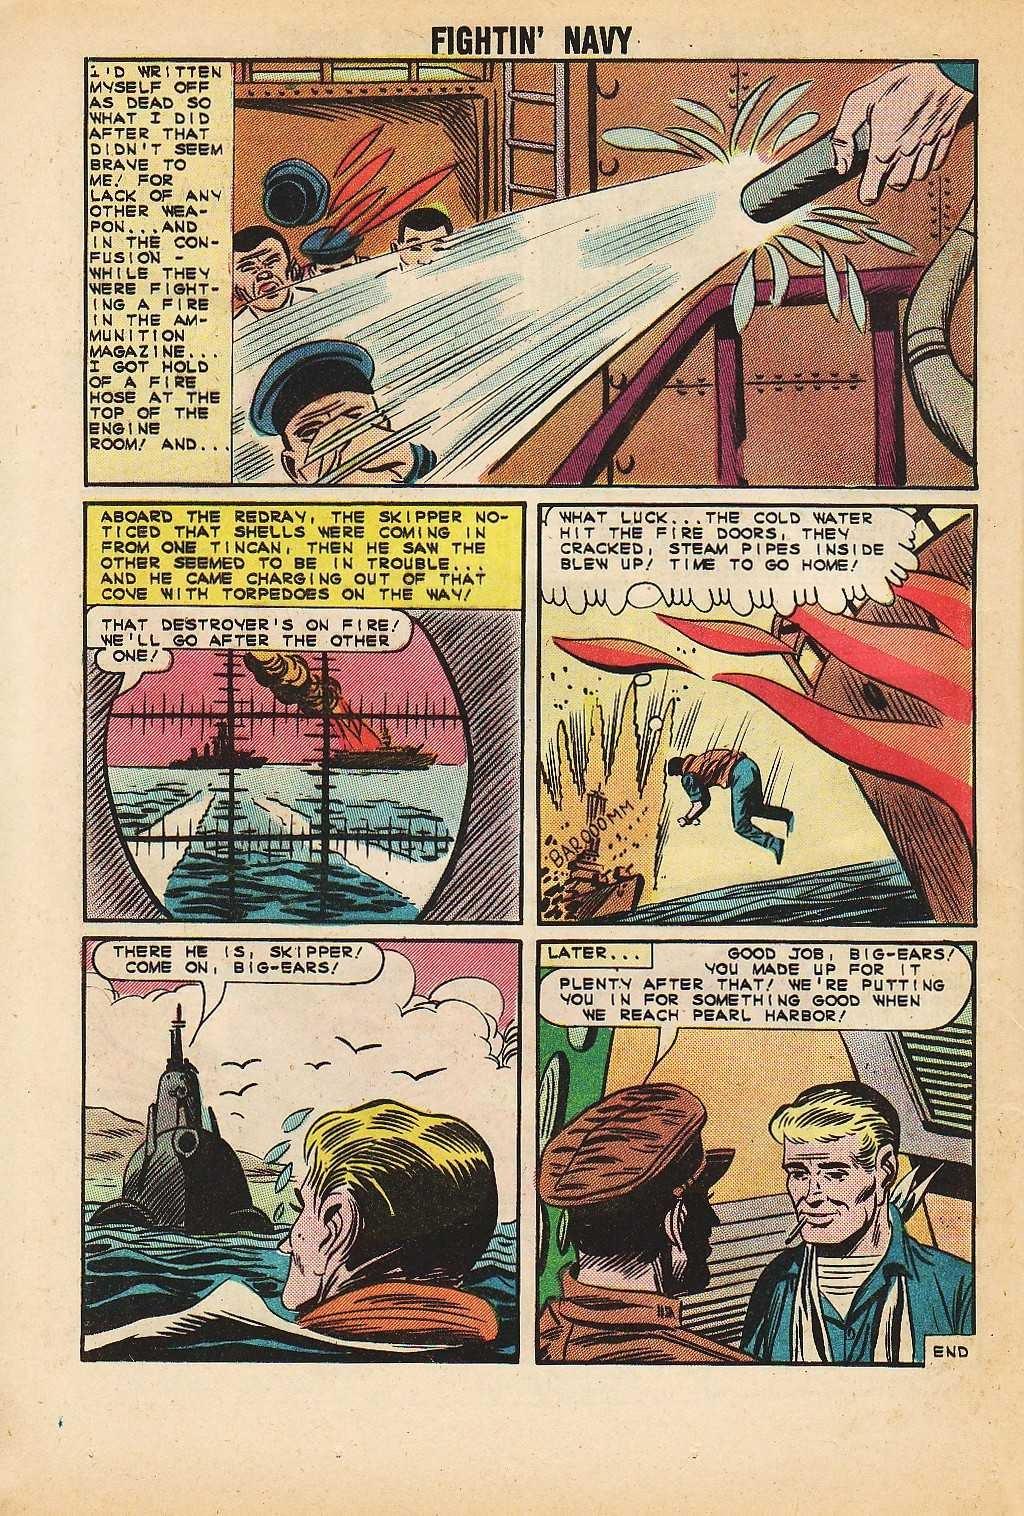 Read online Fightin' Navy comic -  Issue #116 - 24